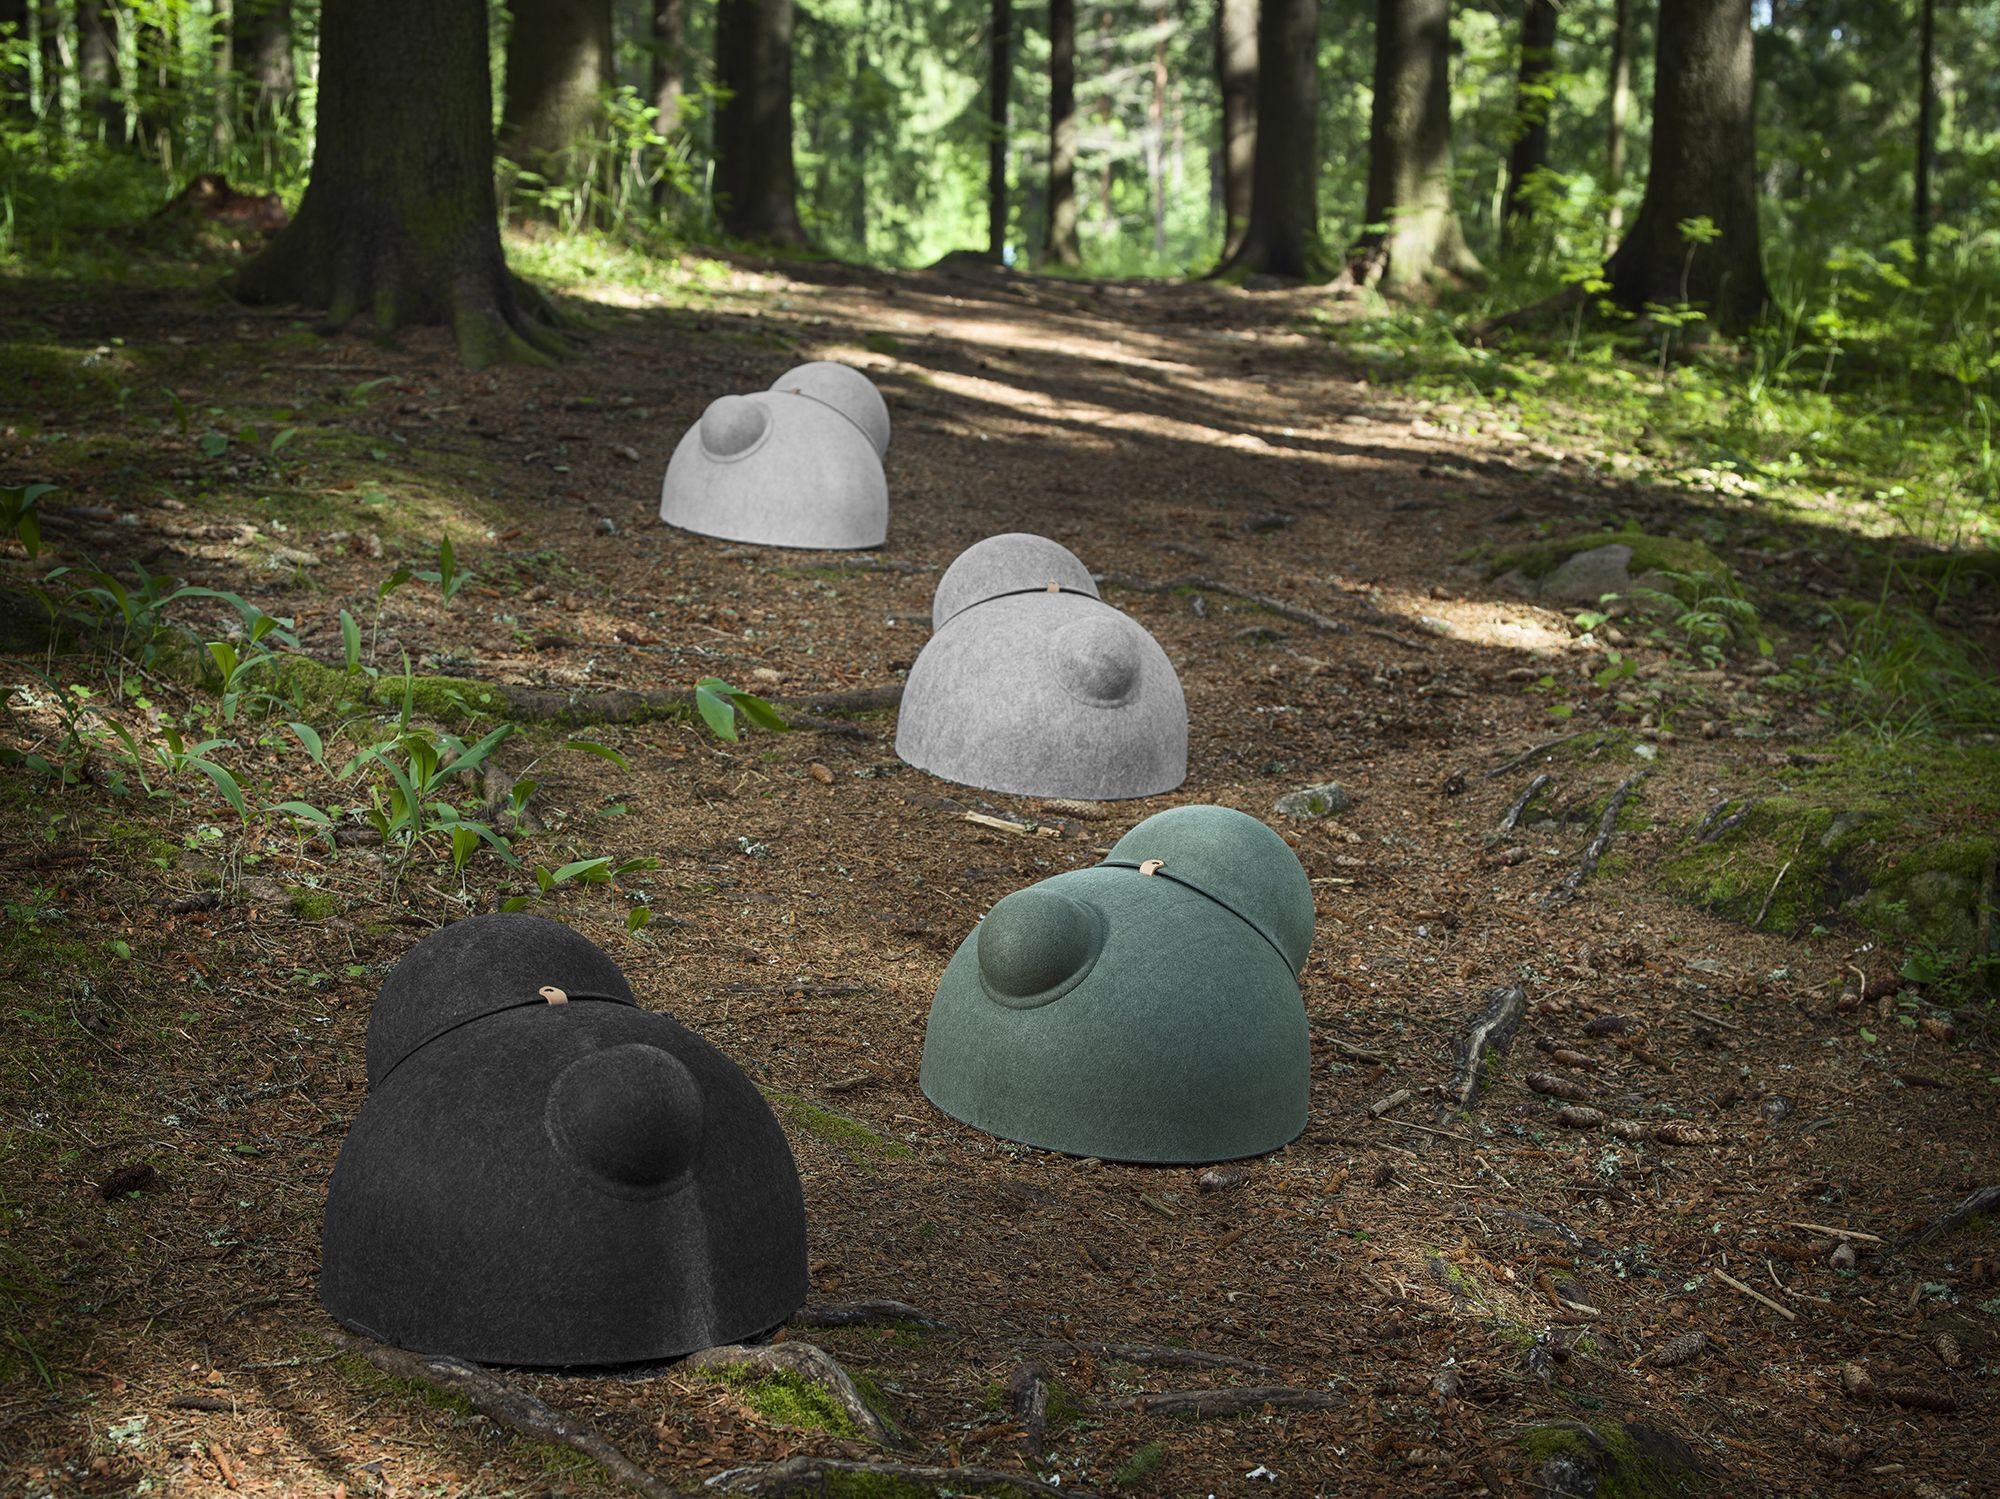 Oloilu Mohko - Forest path brand story